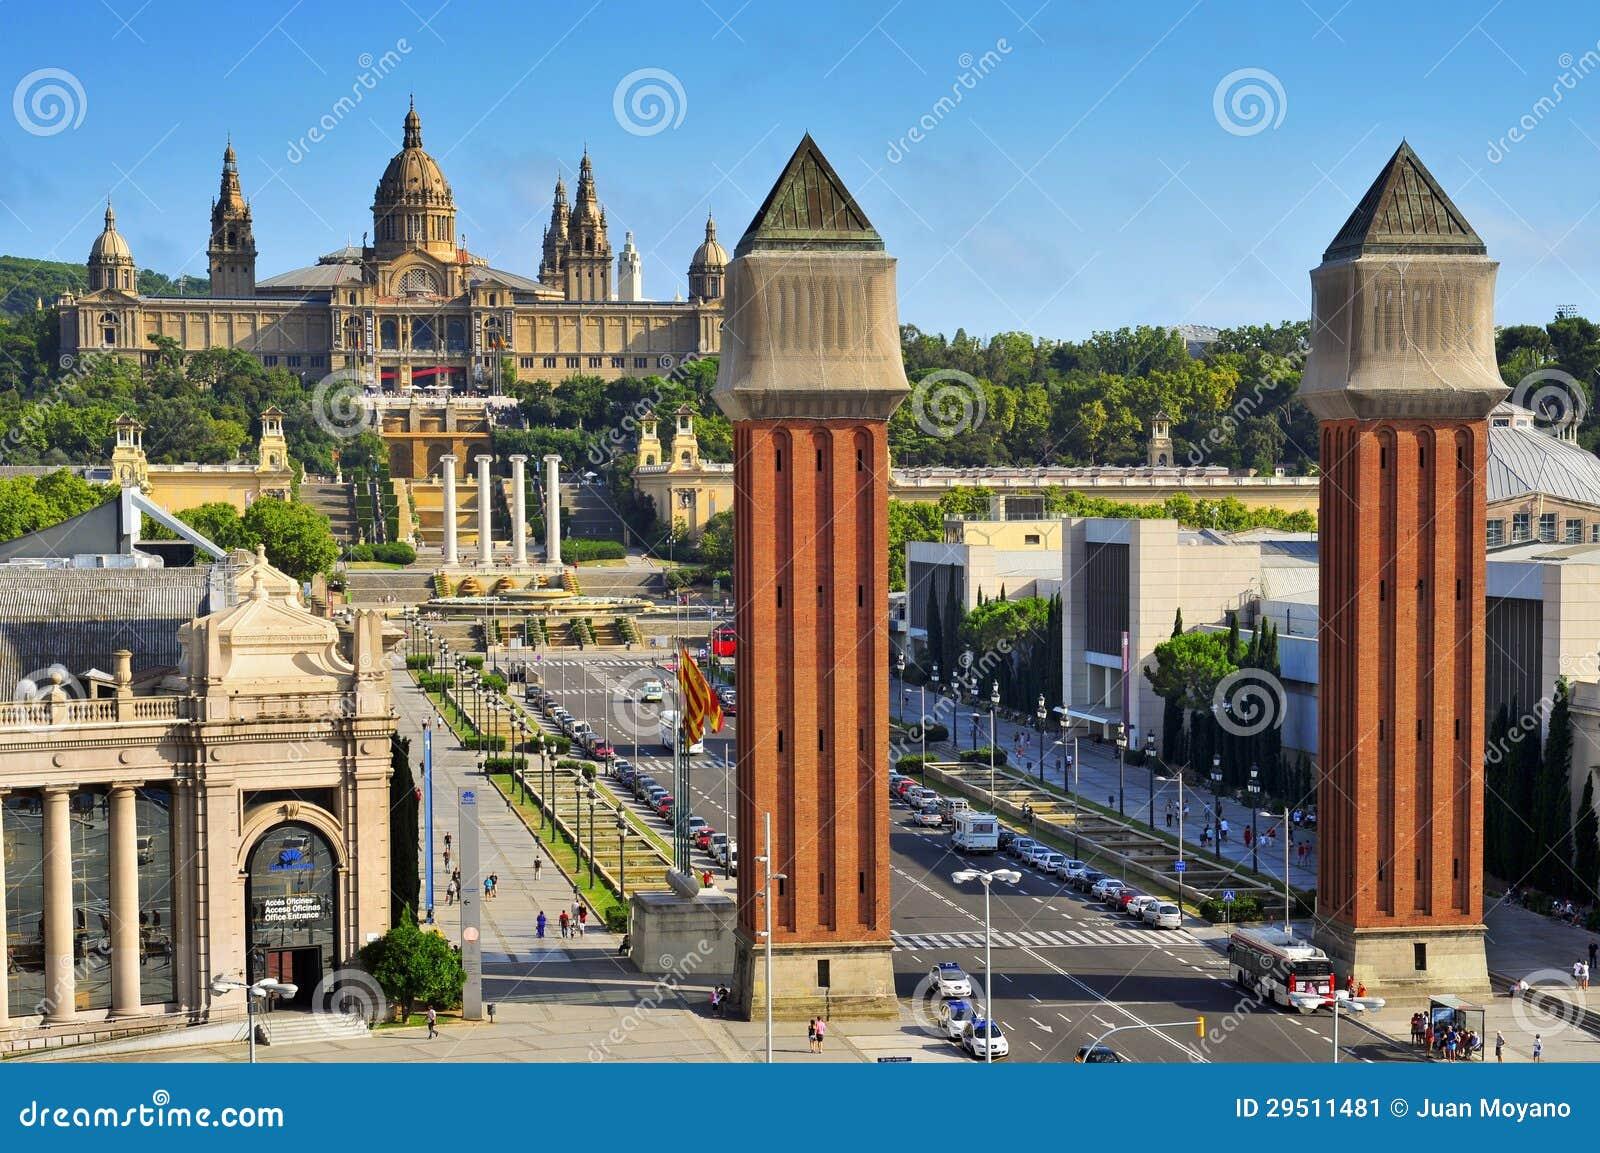 Fira en Palau Nacional in heuvel Montjuic, in Barcelona, Spanje